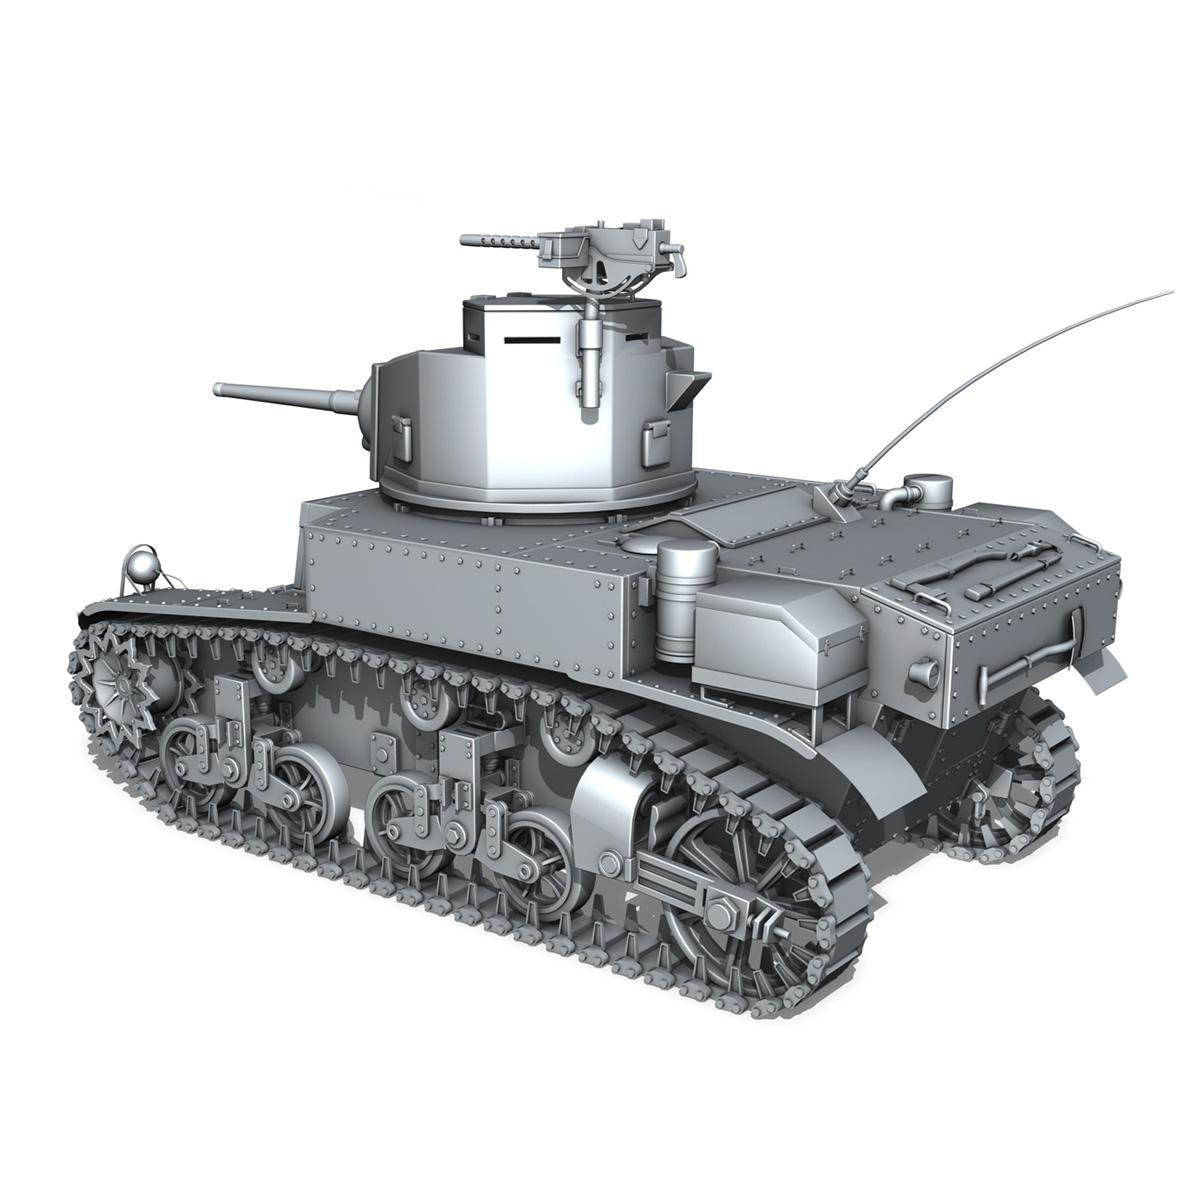 m3 light tank stuart – early production 3d model 3ds fbx c4d lwo obj 189172